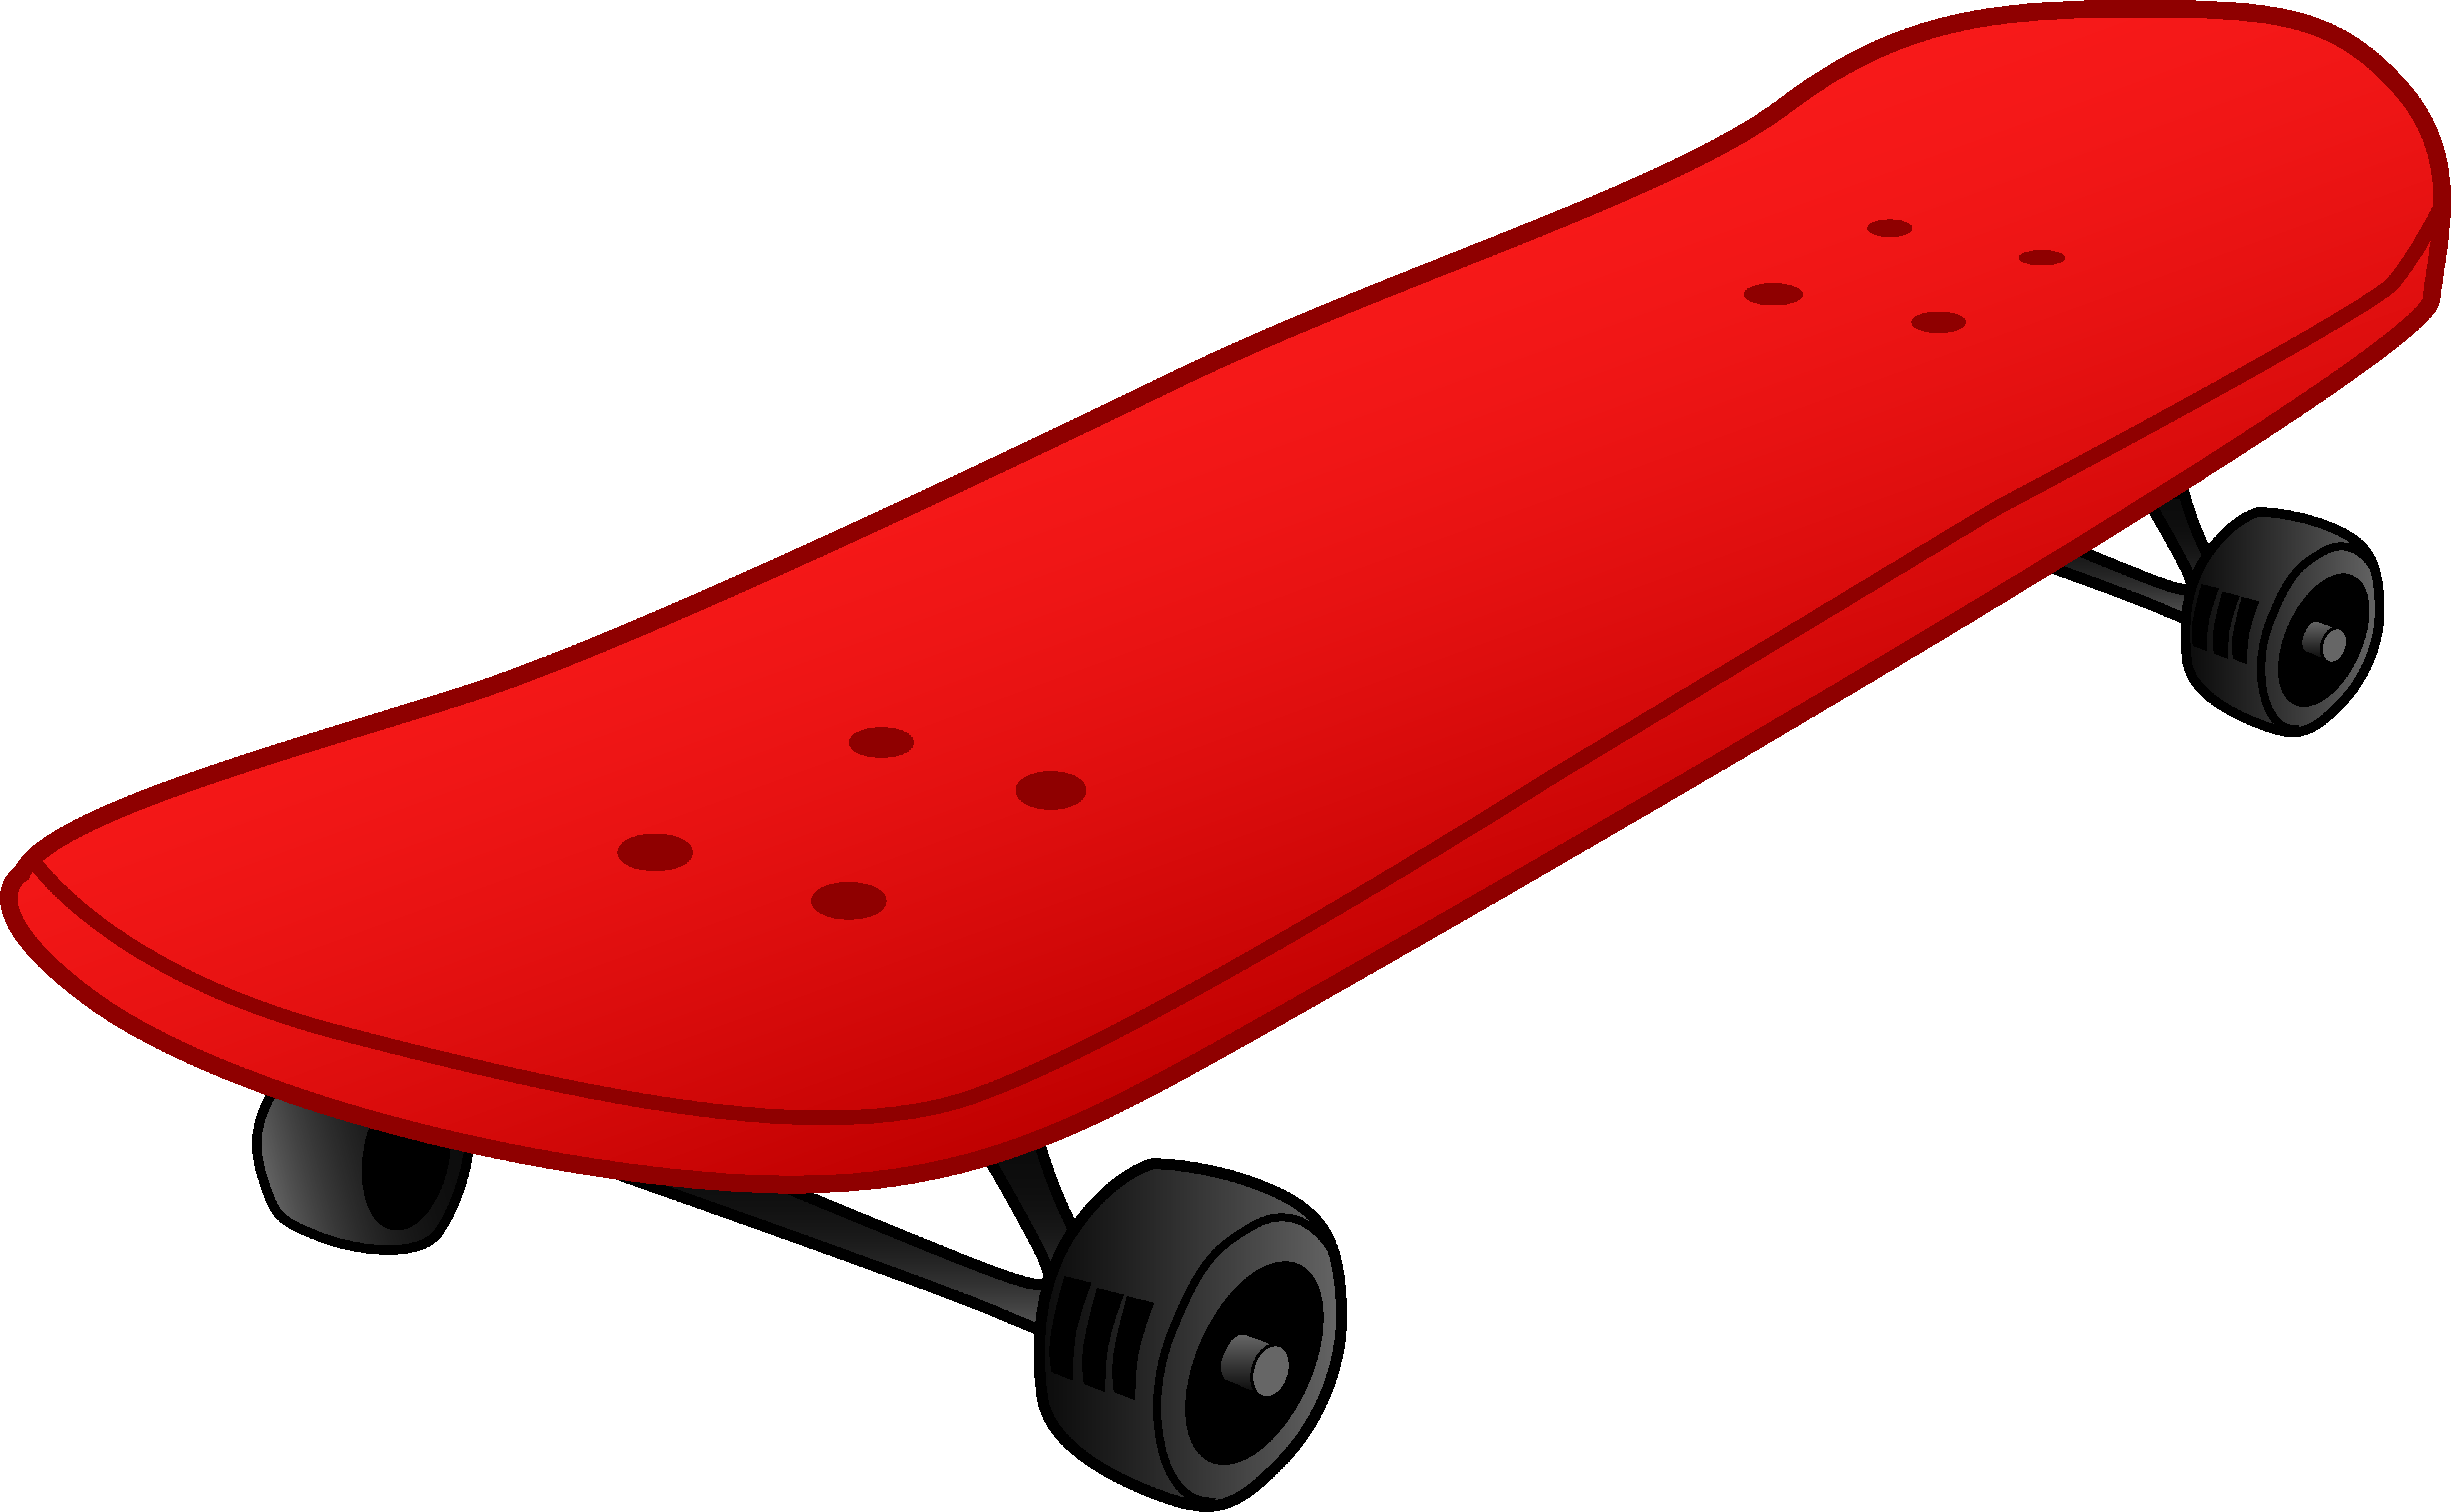 Skateboard PNG HD - Skateboard HD PNG